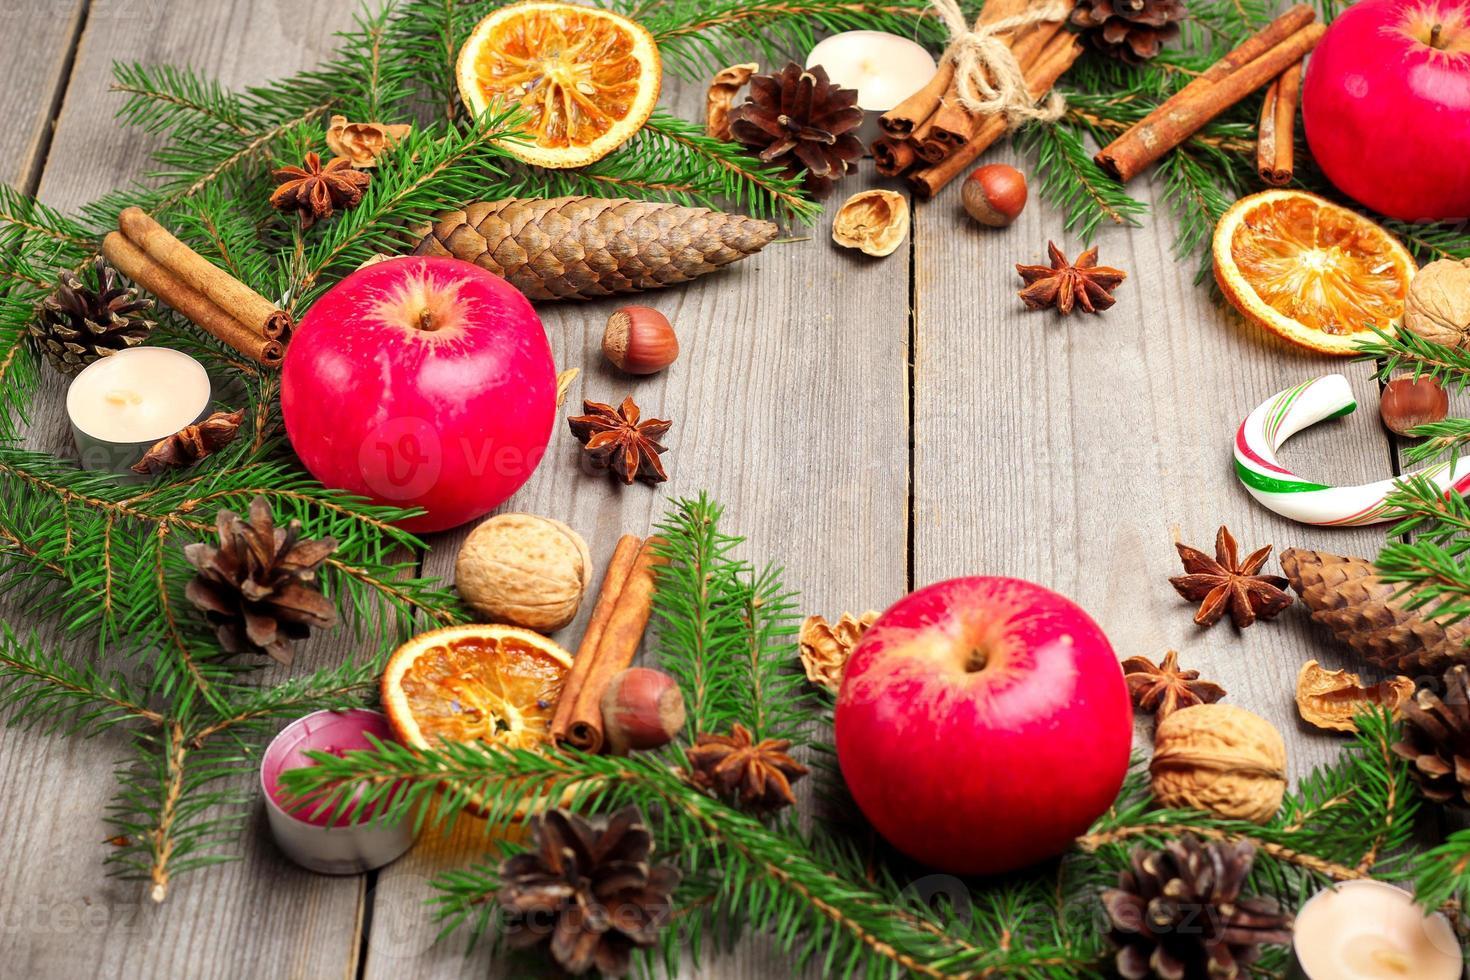 Kerstdecoratie met dennenboom, sinaasappels, kegels, kruiden, appl foto